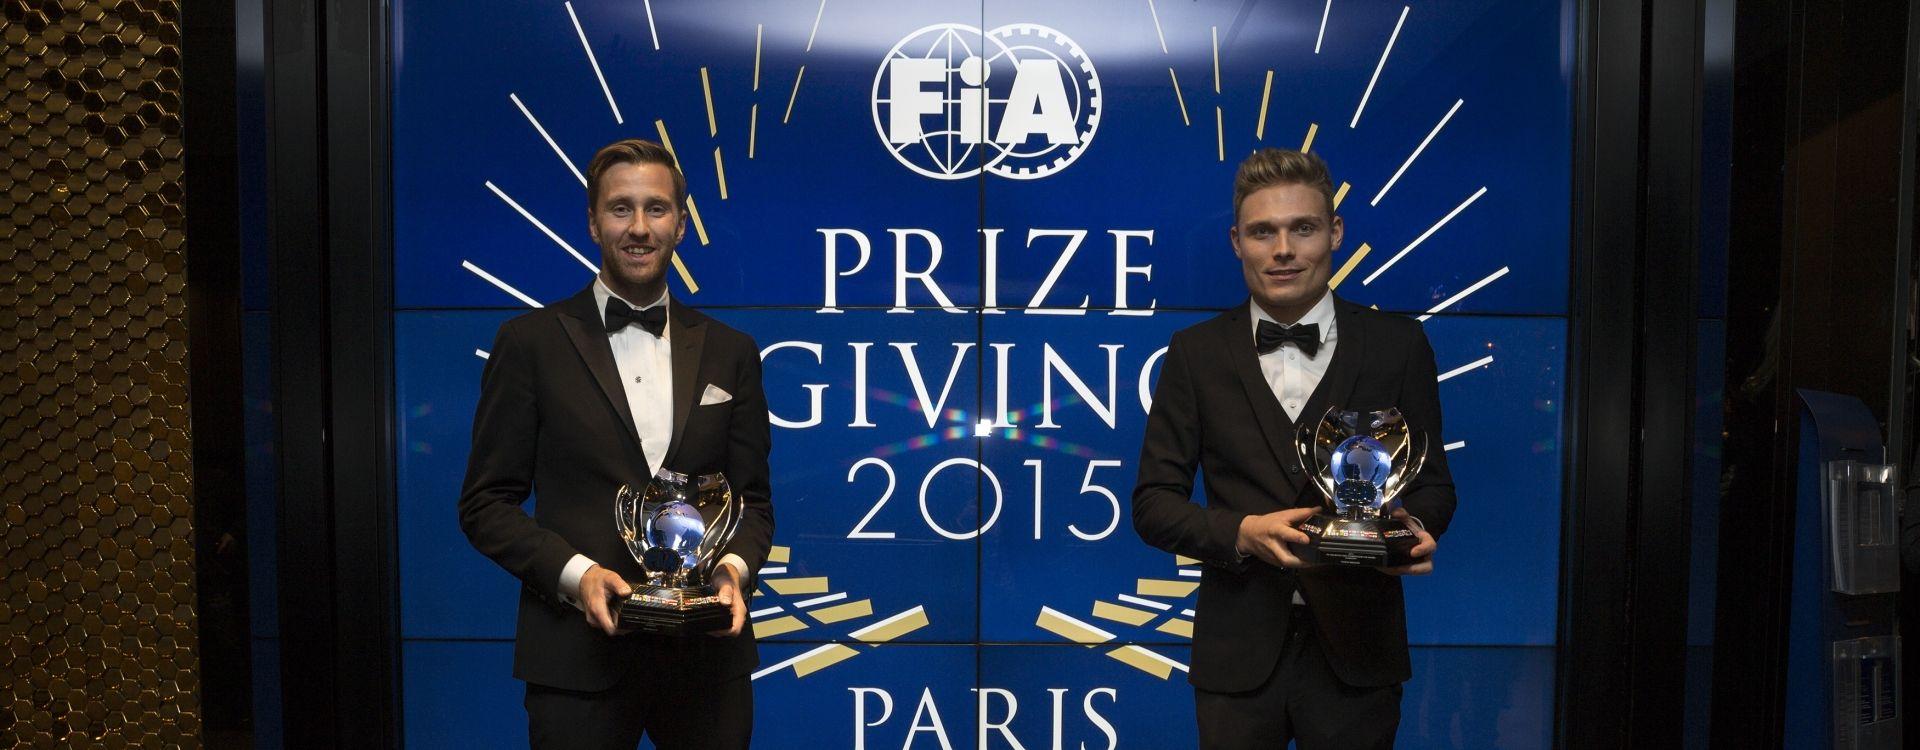 FIA Honours ŠKODA's APRC Champions